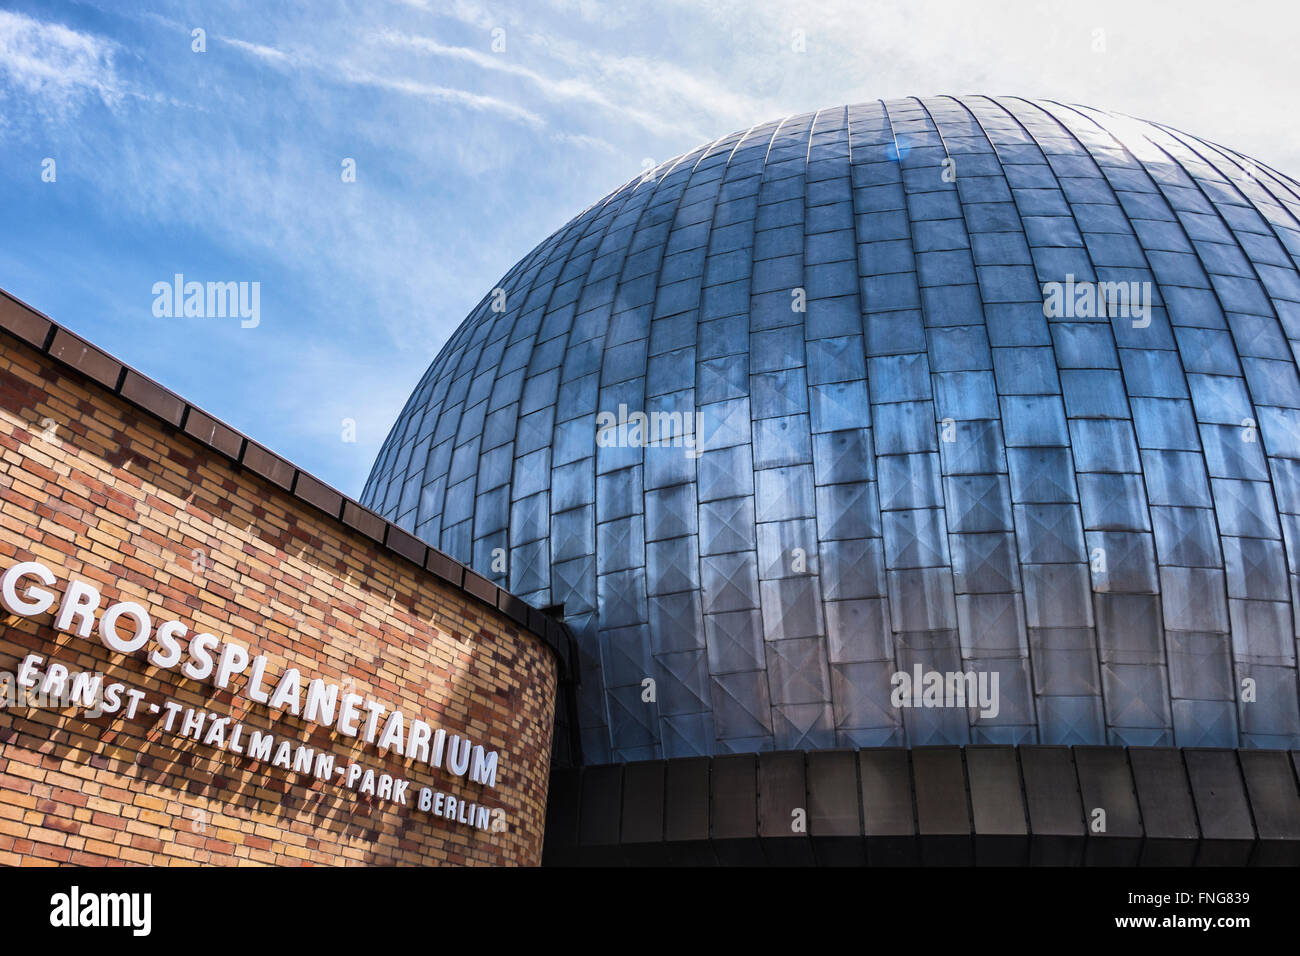 Entfernungsmesser Berlin : Zeiss entfernungsmesser berlin neuwertige fernglastasche köcher